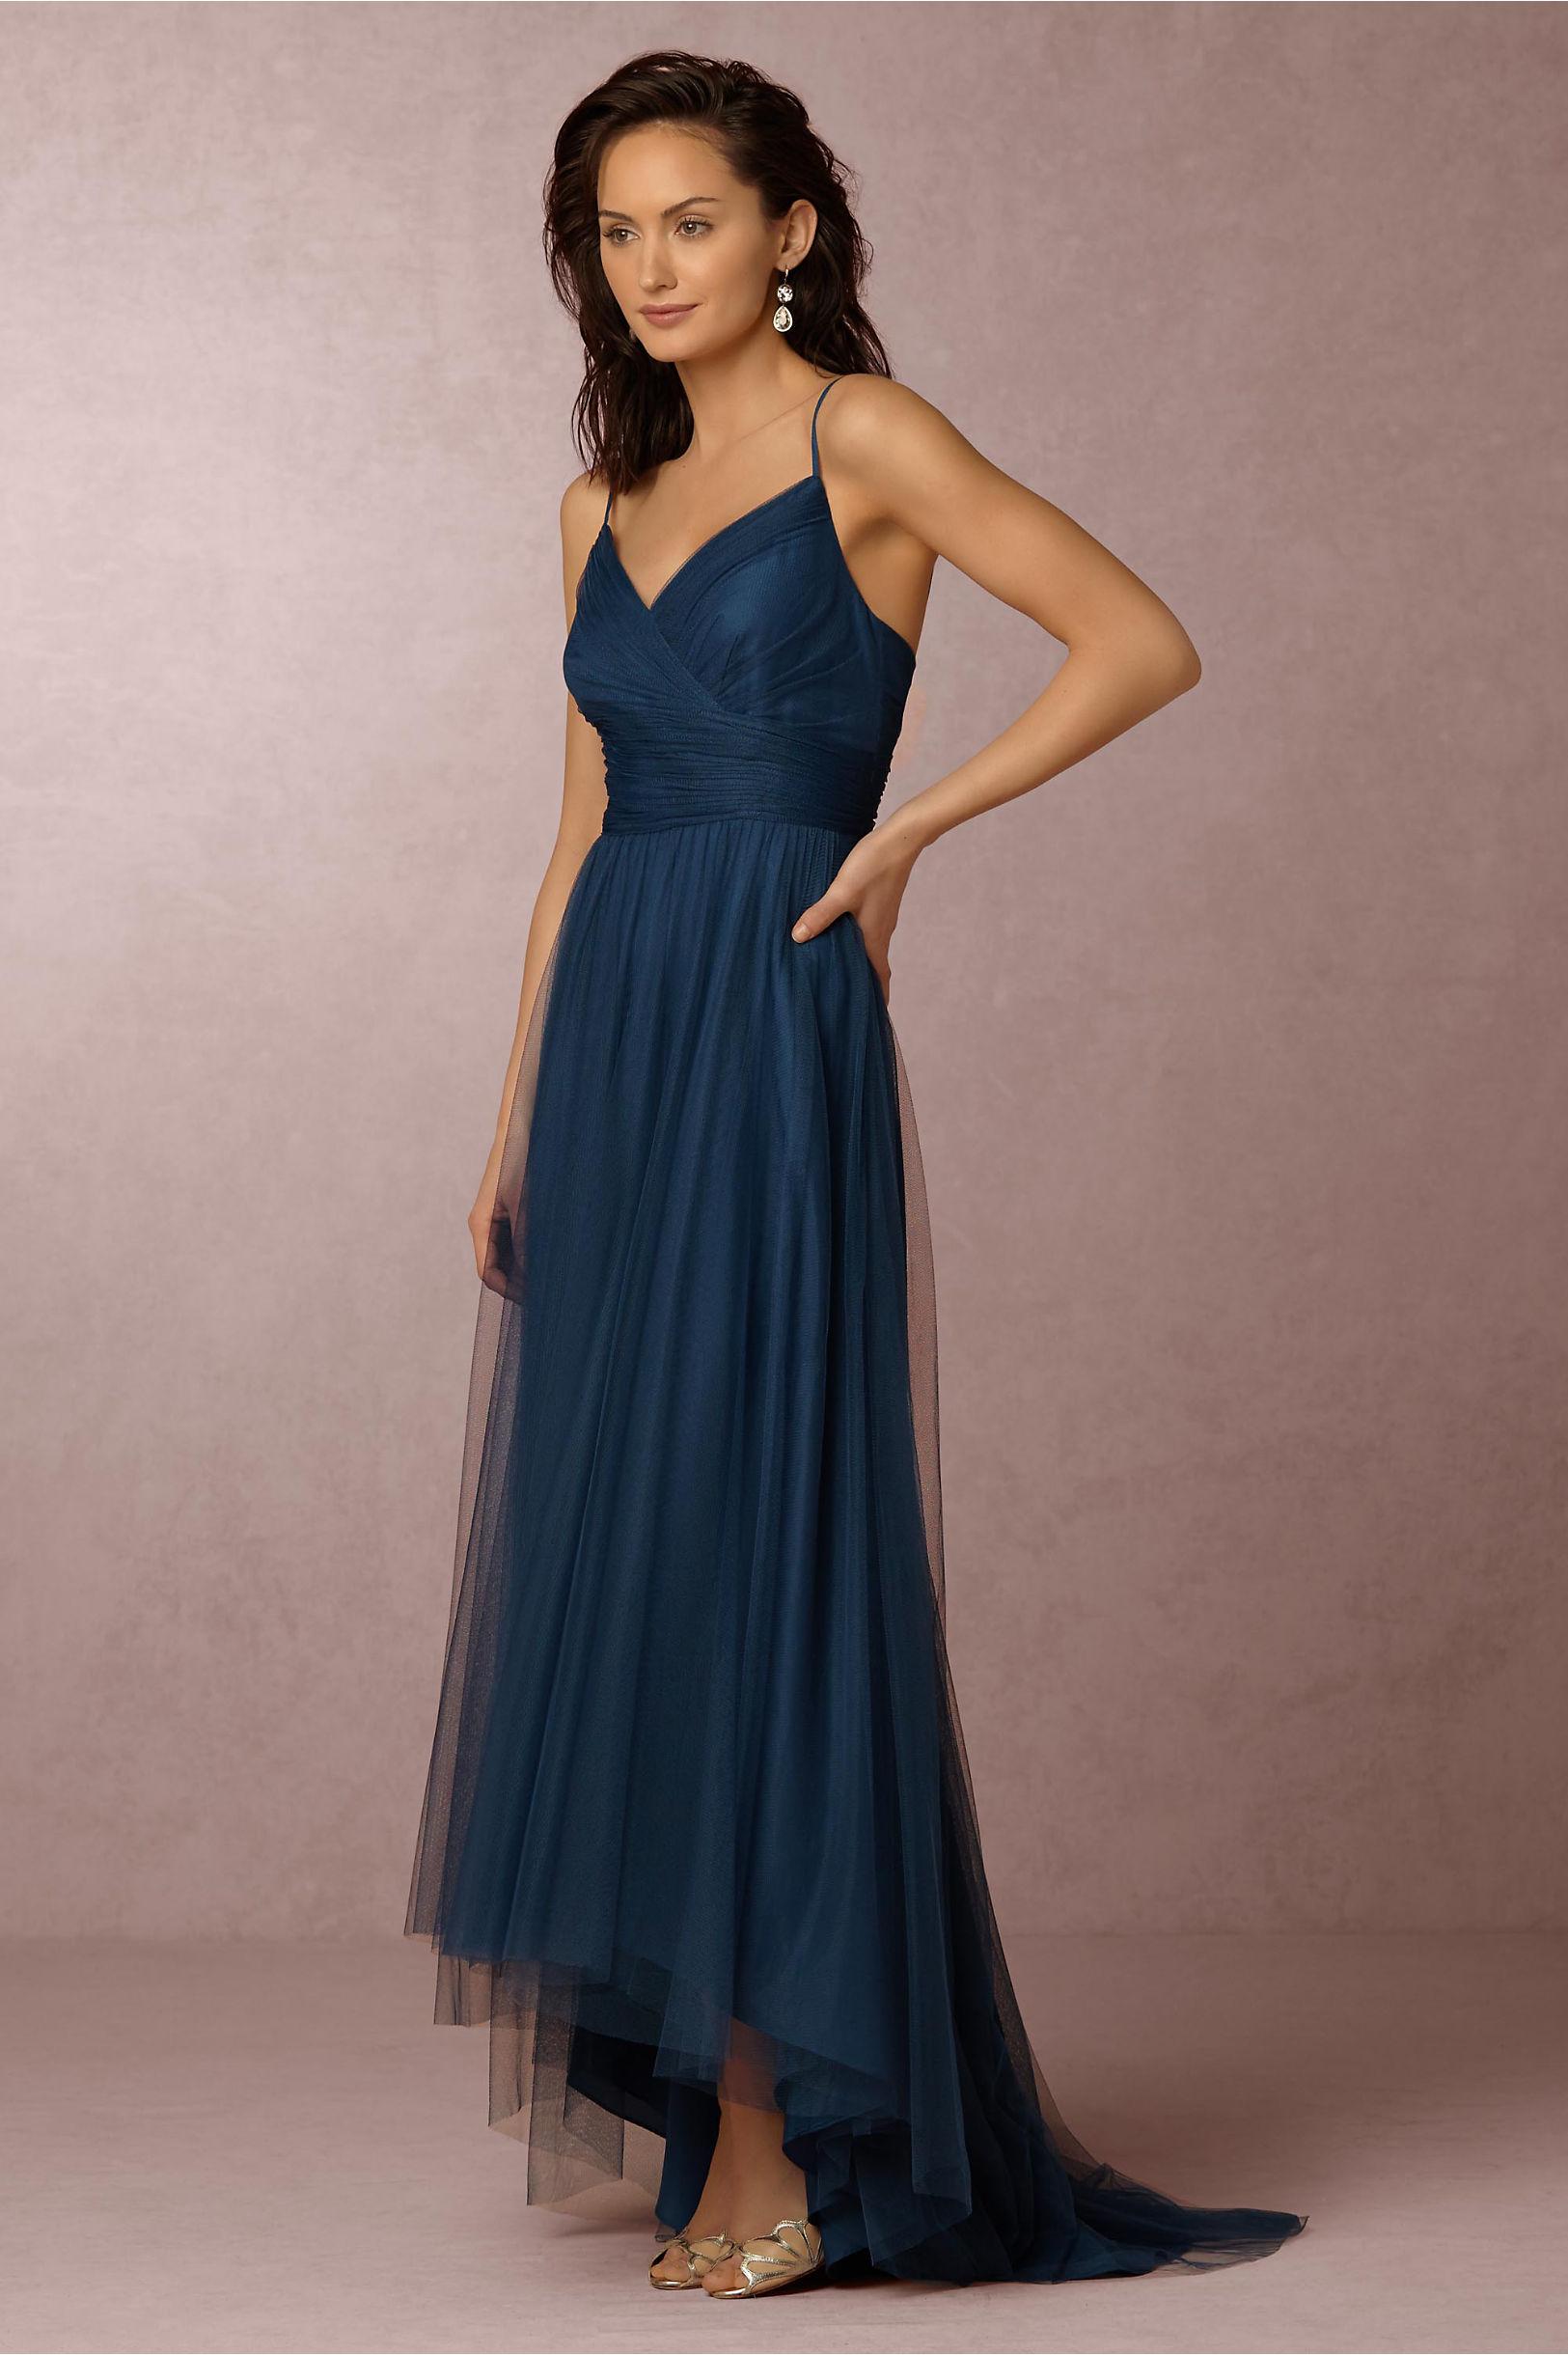 Brinkley dress in bridal party bhldn monique lhuillier bridesmaids lapis brinkley dress bhldn ombrellifo Images